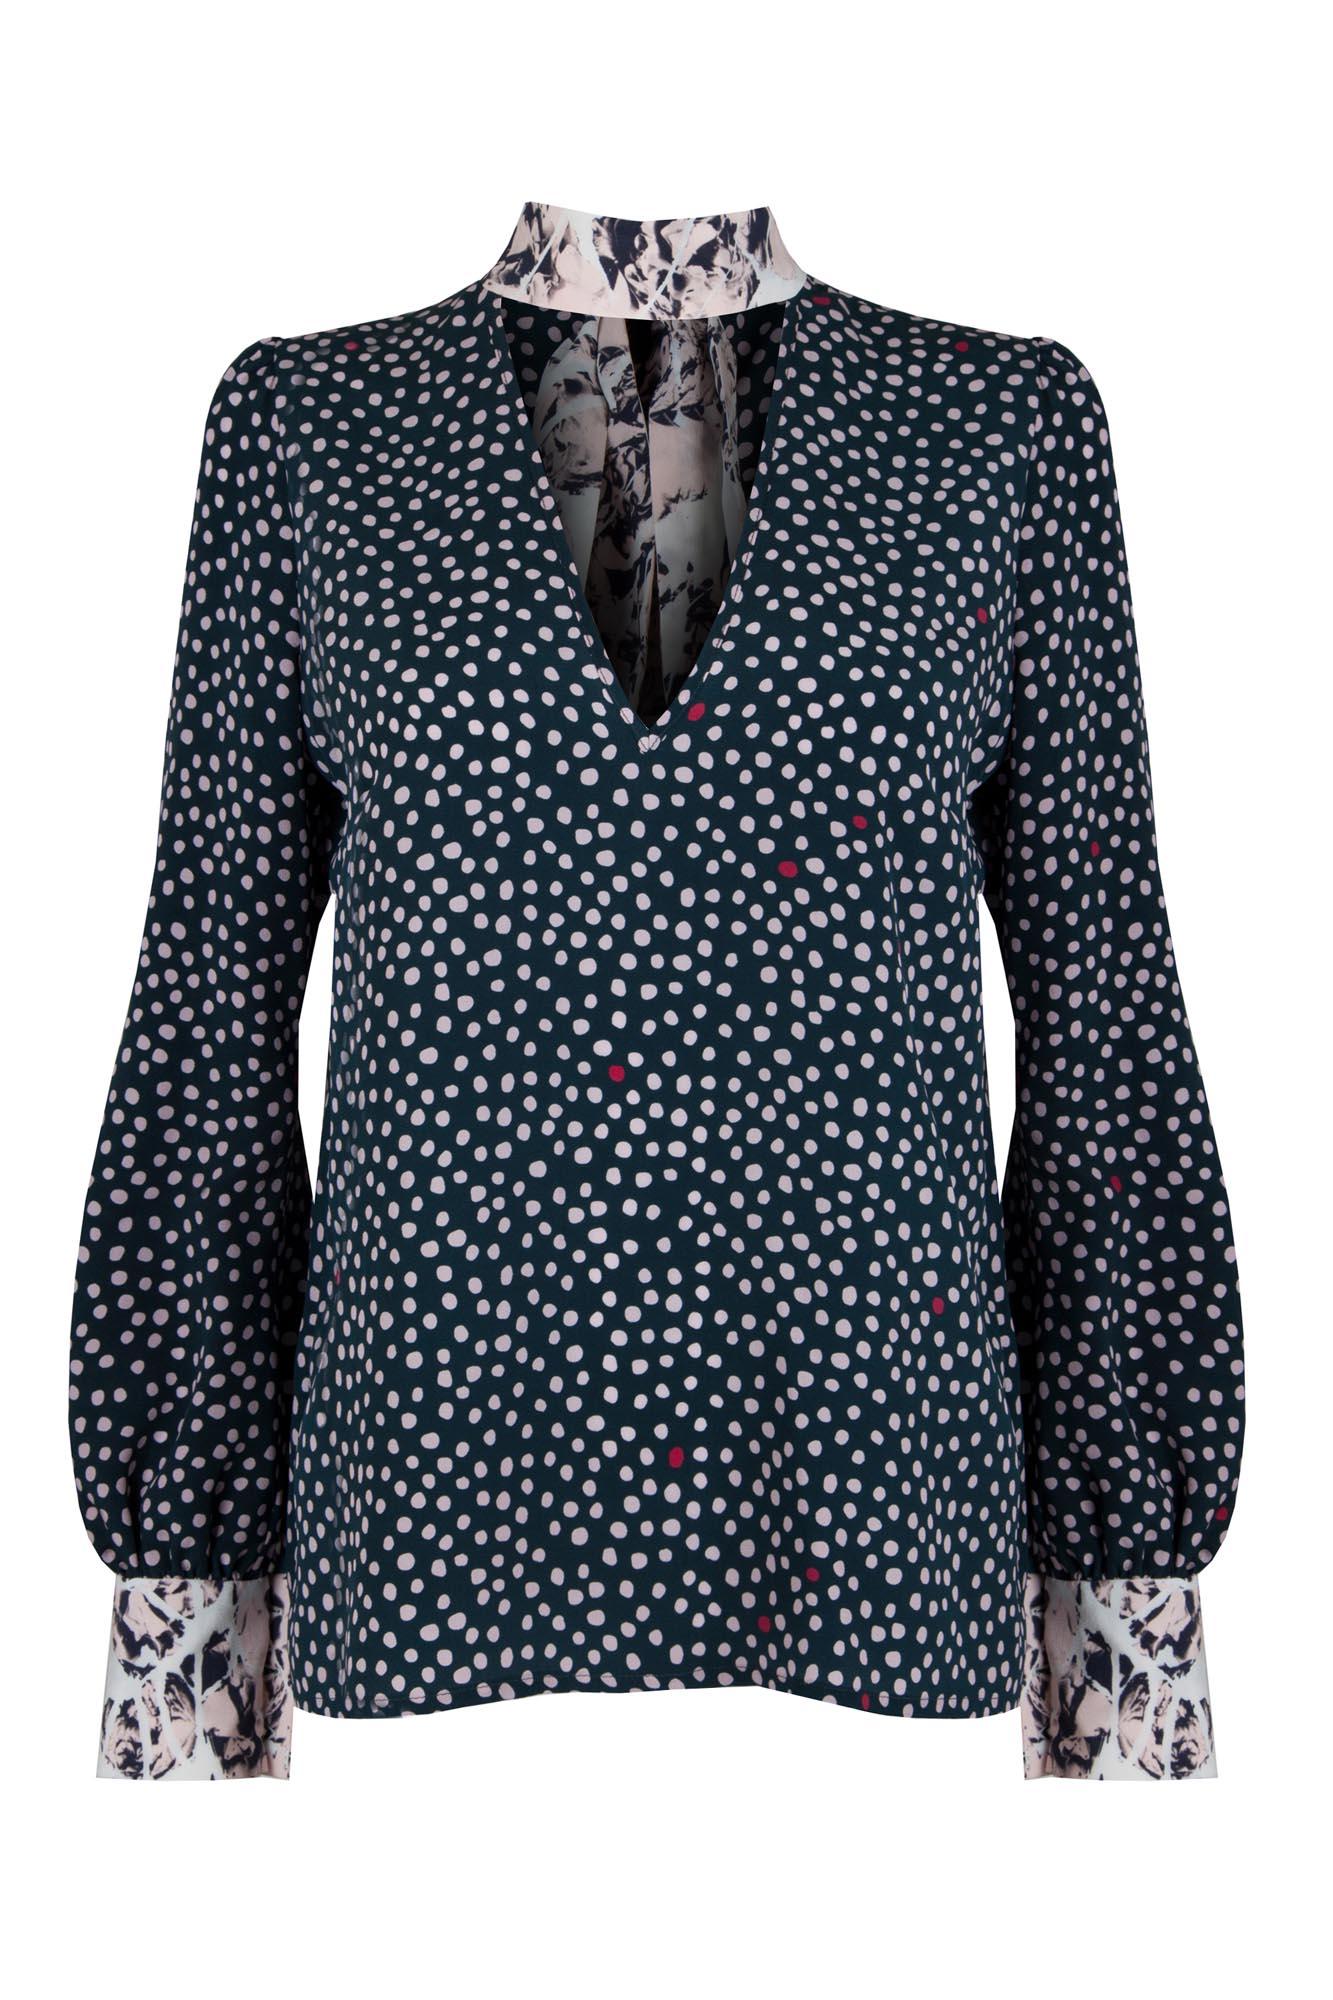 Tori Polka Play blouse